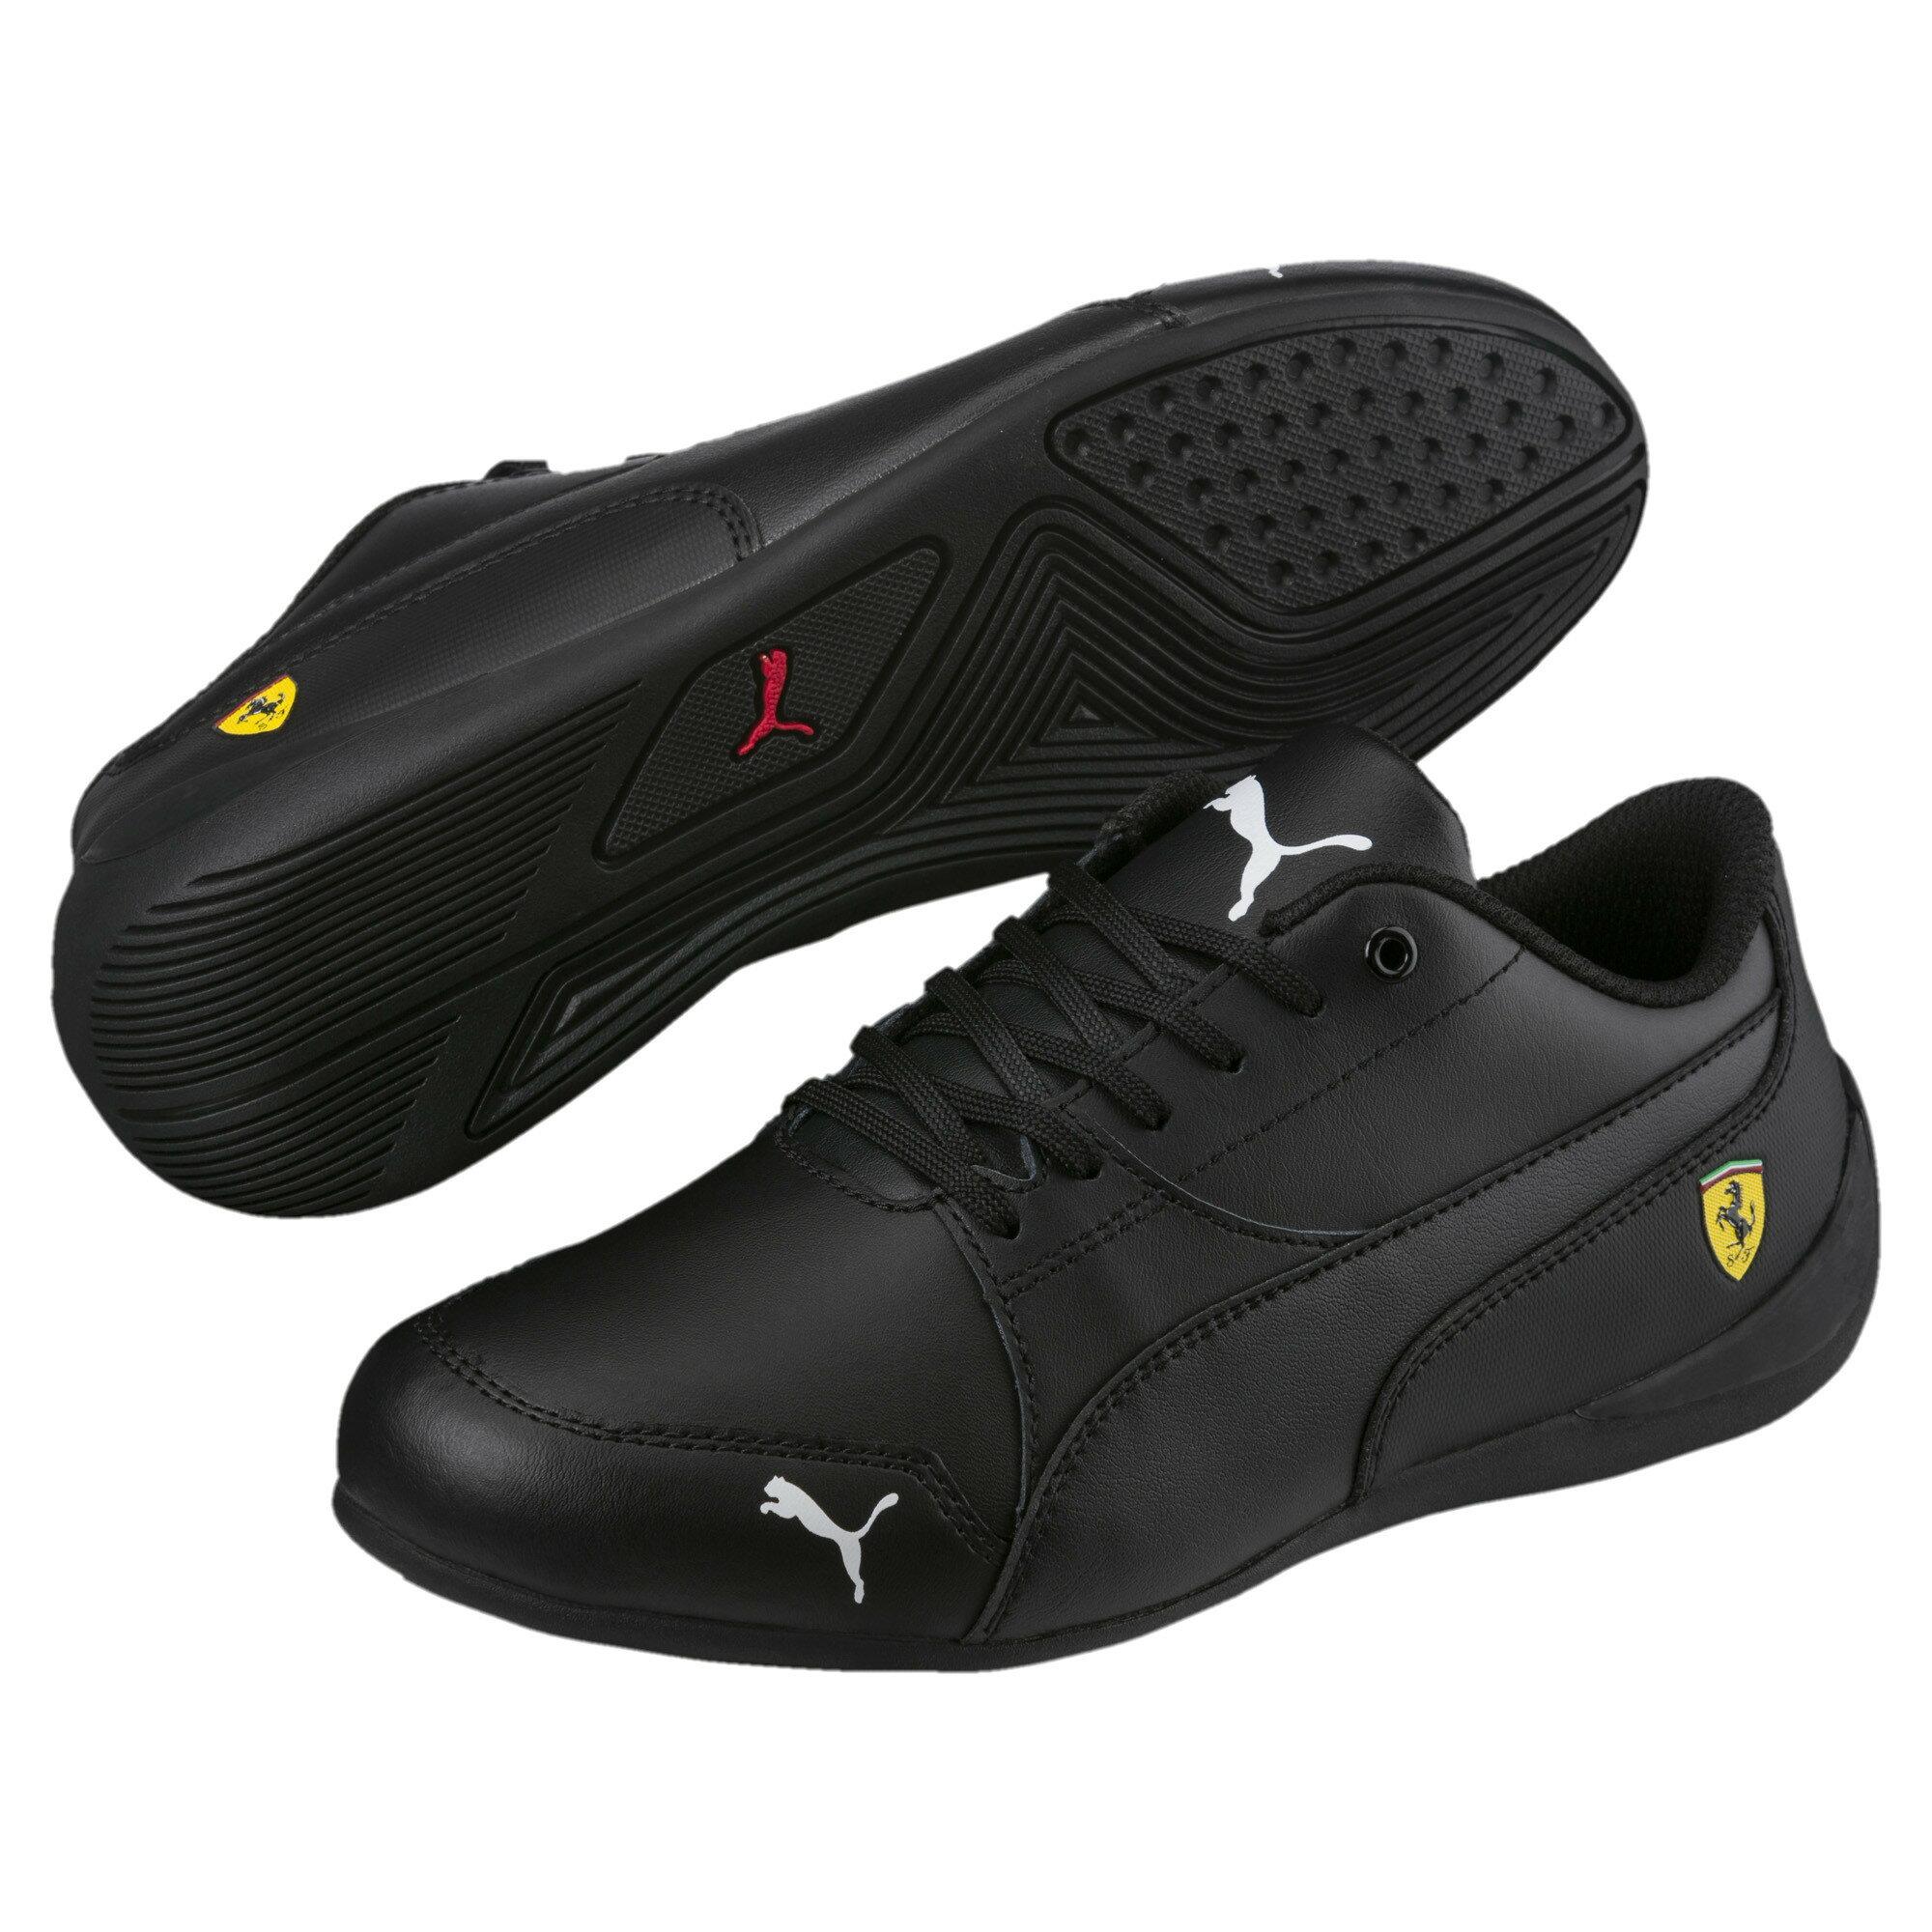 3d52e98d29b0 Official Puma Store  PUMA Ferrari Drift Cat 7 Kids  Sneakers ...